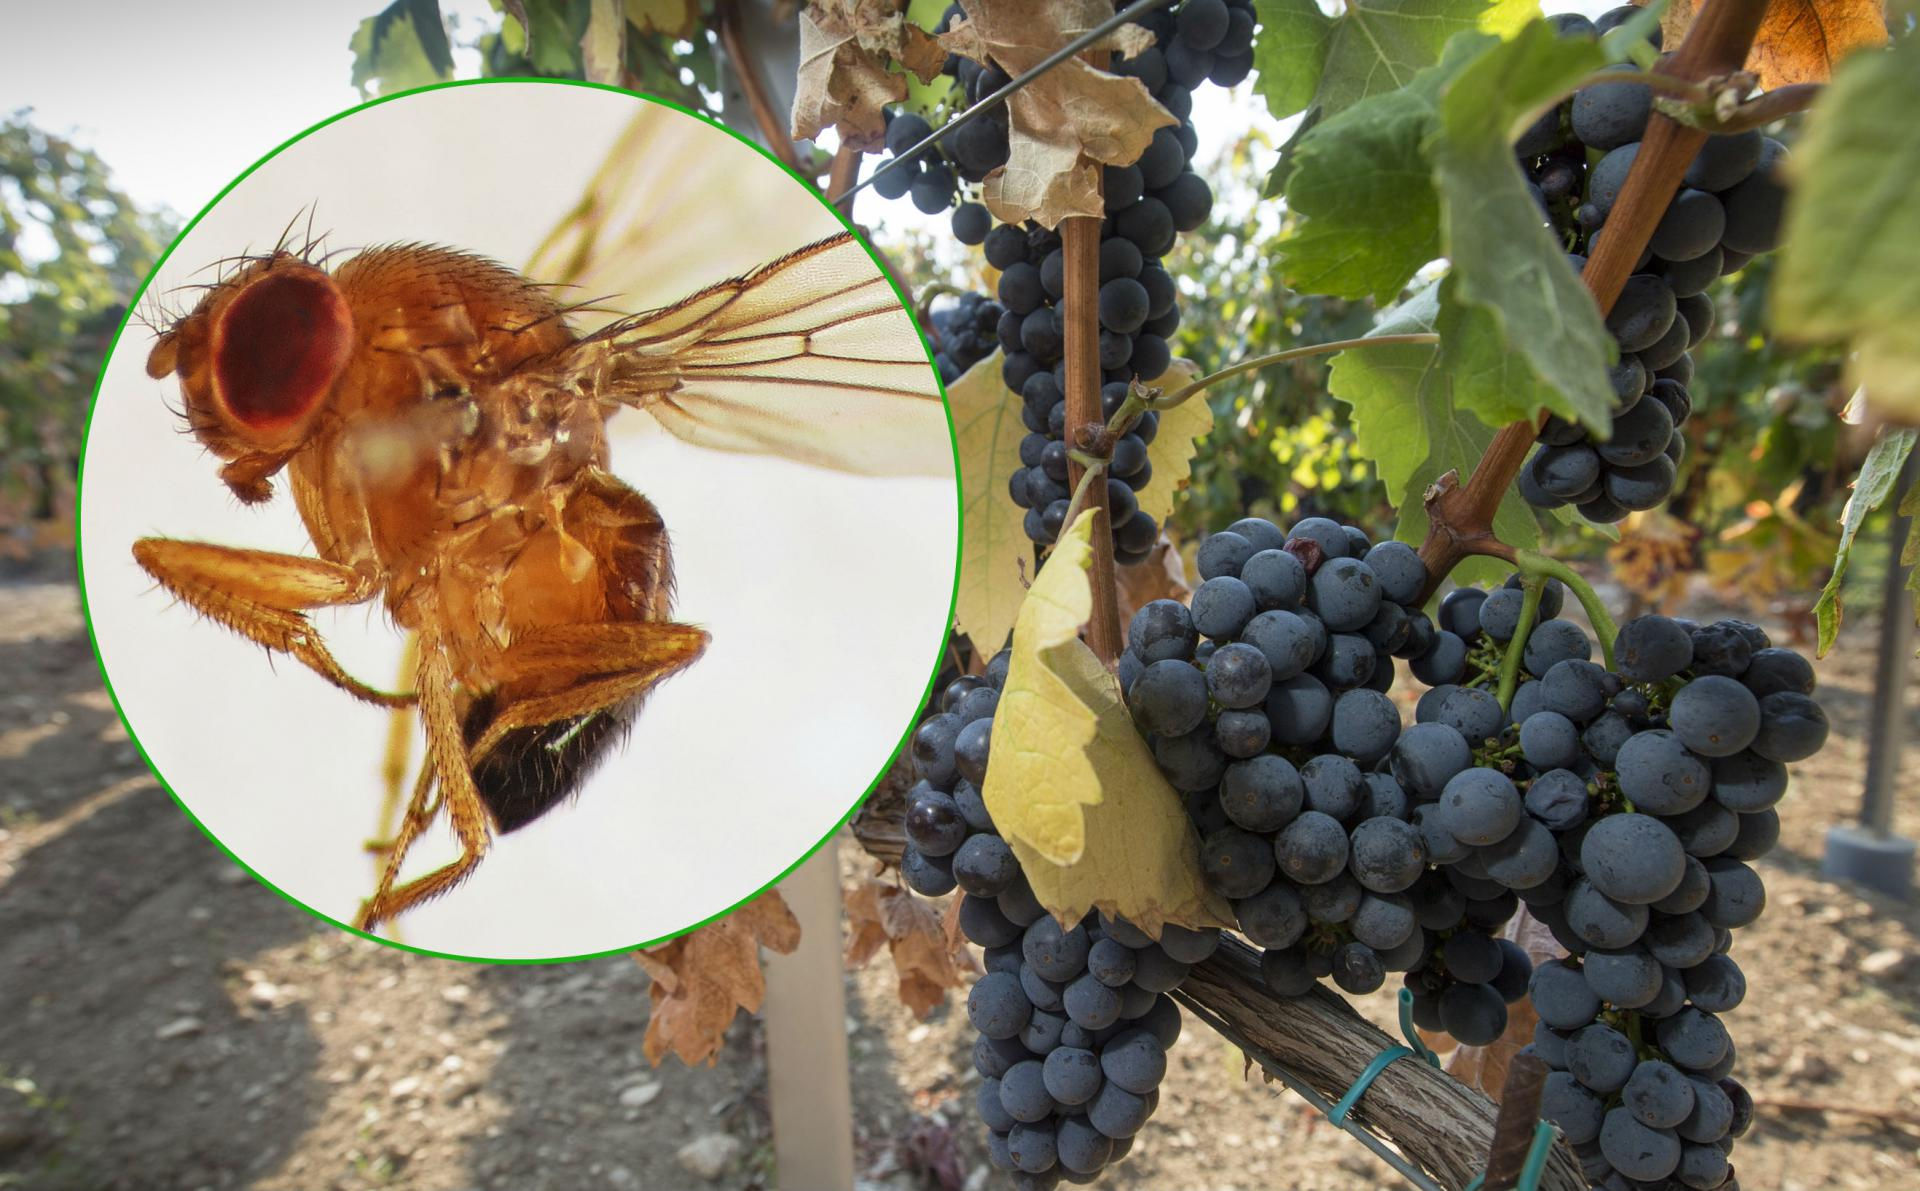 Drosophila suzukii i trsovi crljenka